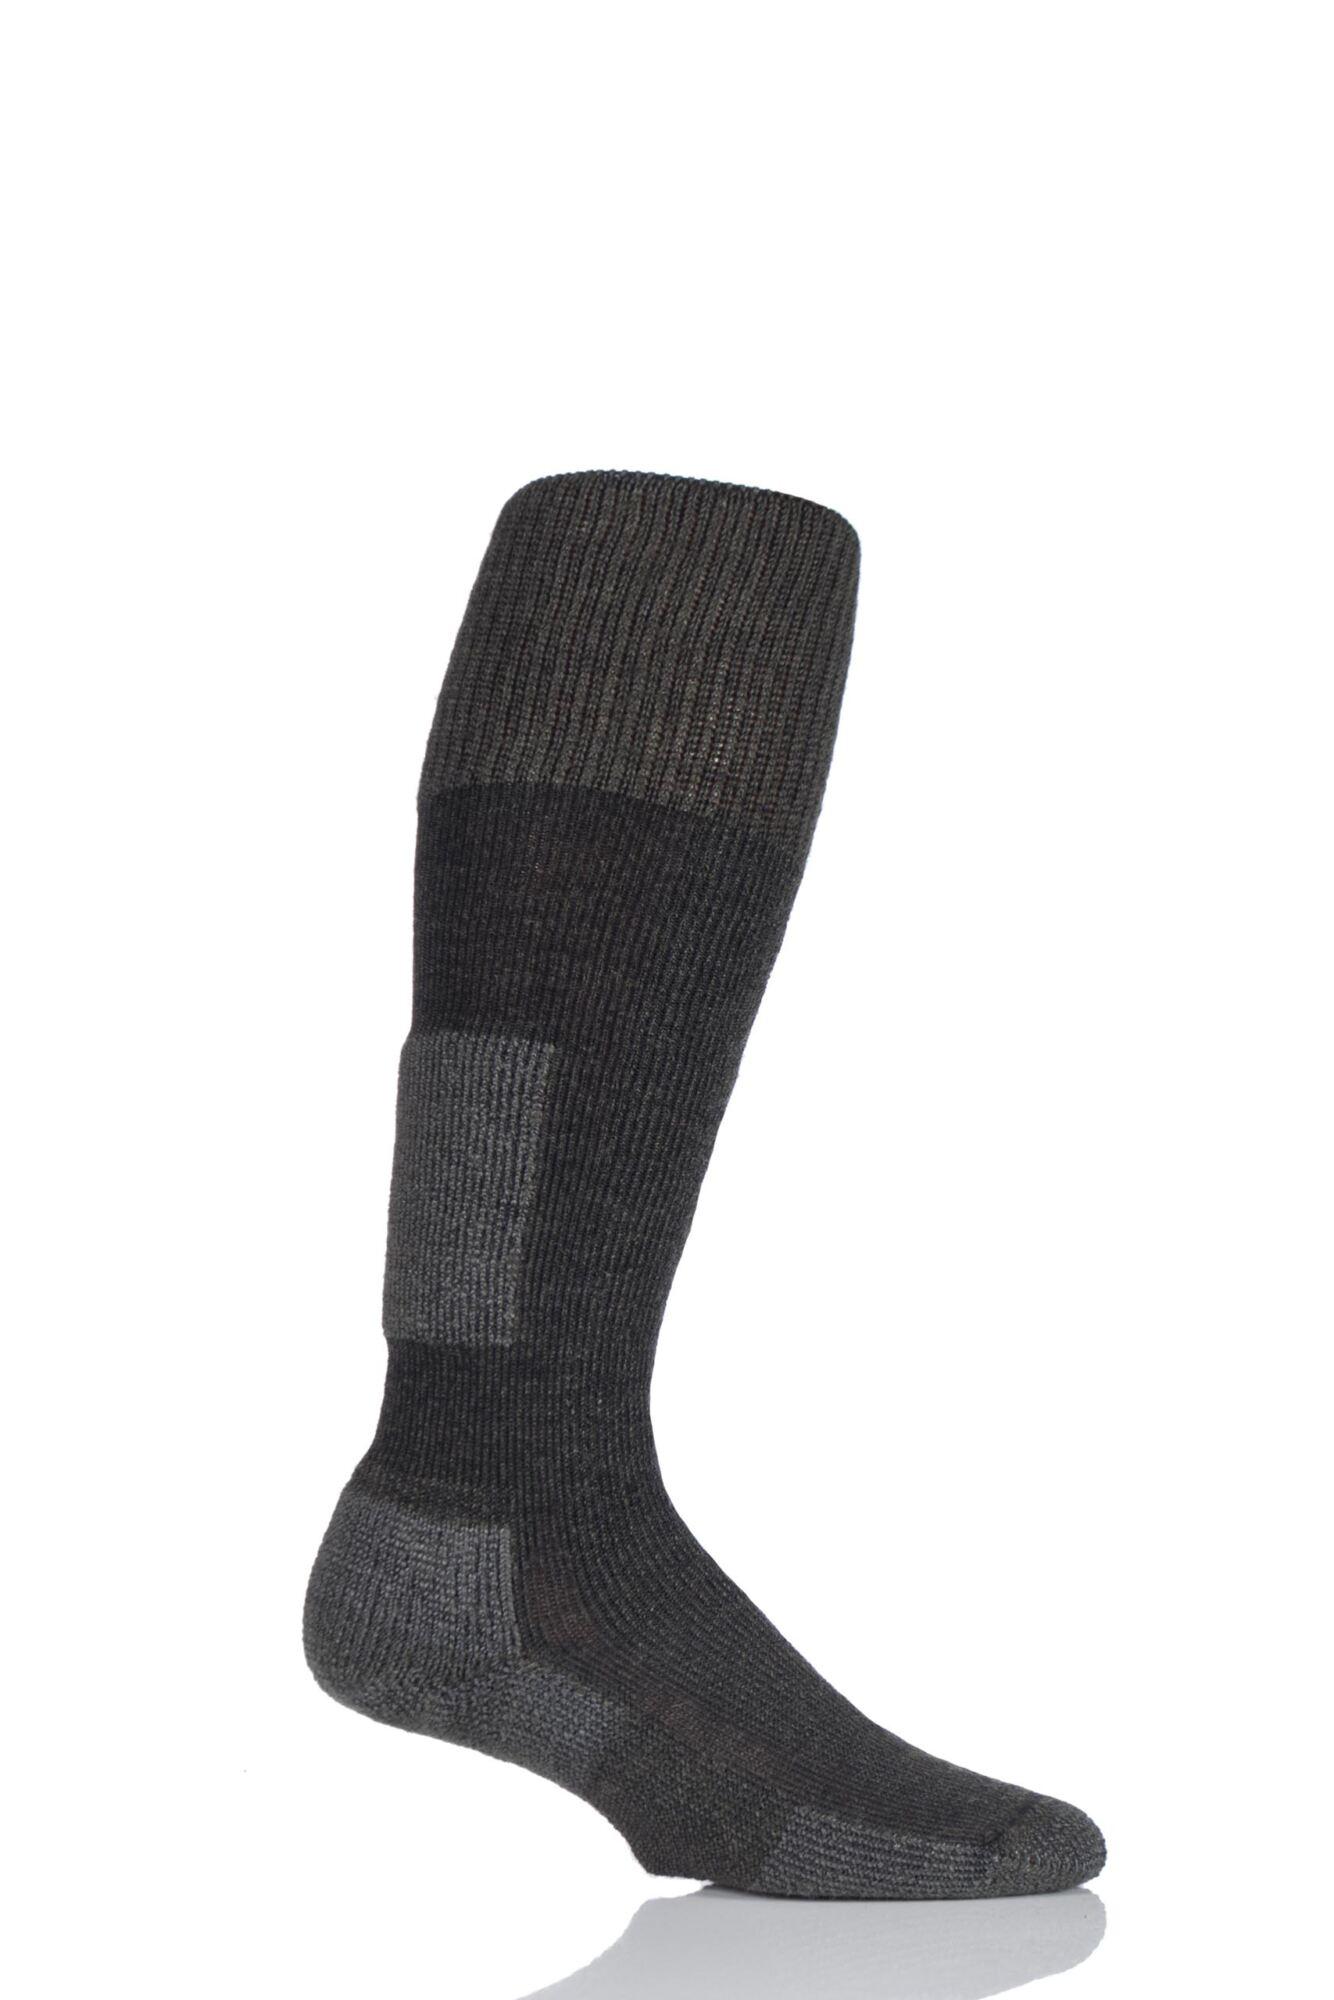 1 Pair Snow Board Thick Cushion Socks With Thorwick Unisex - Thorlos